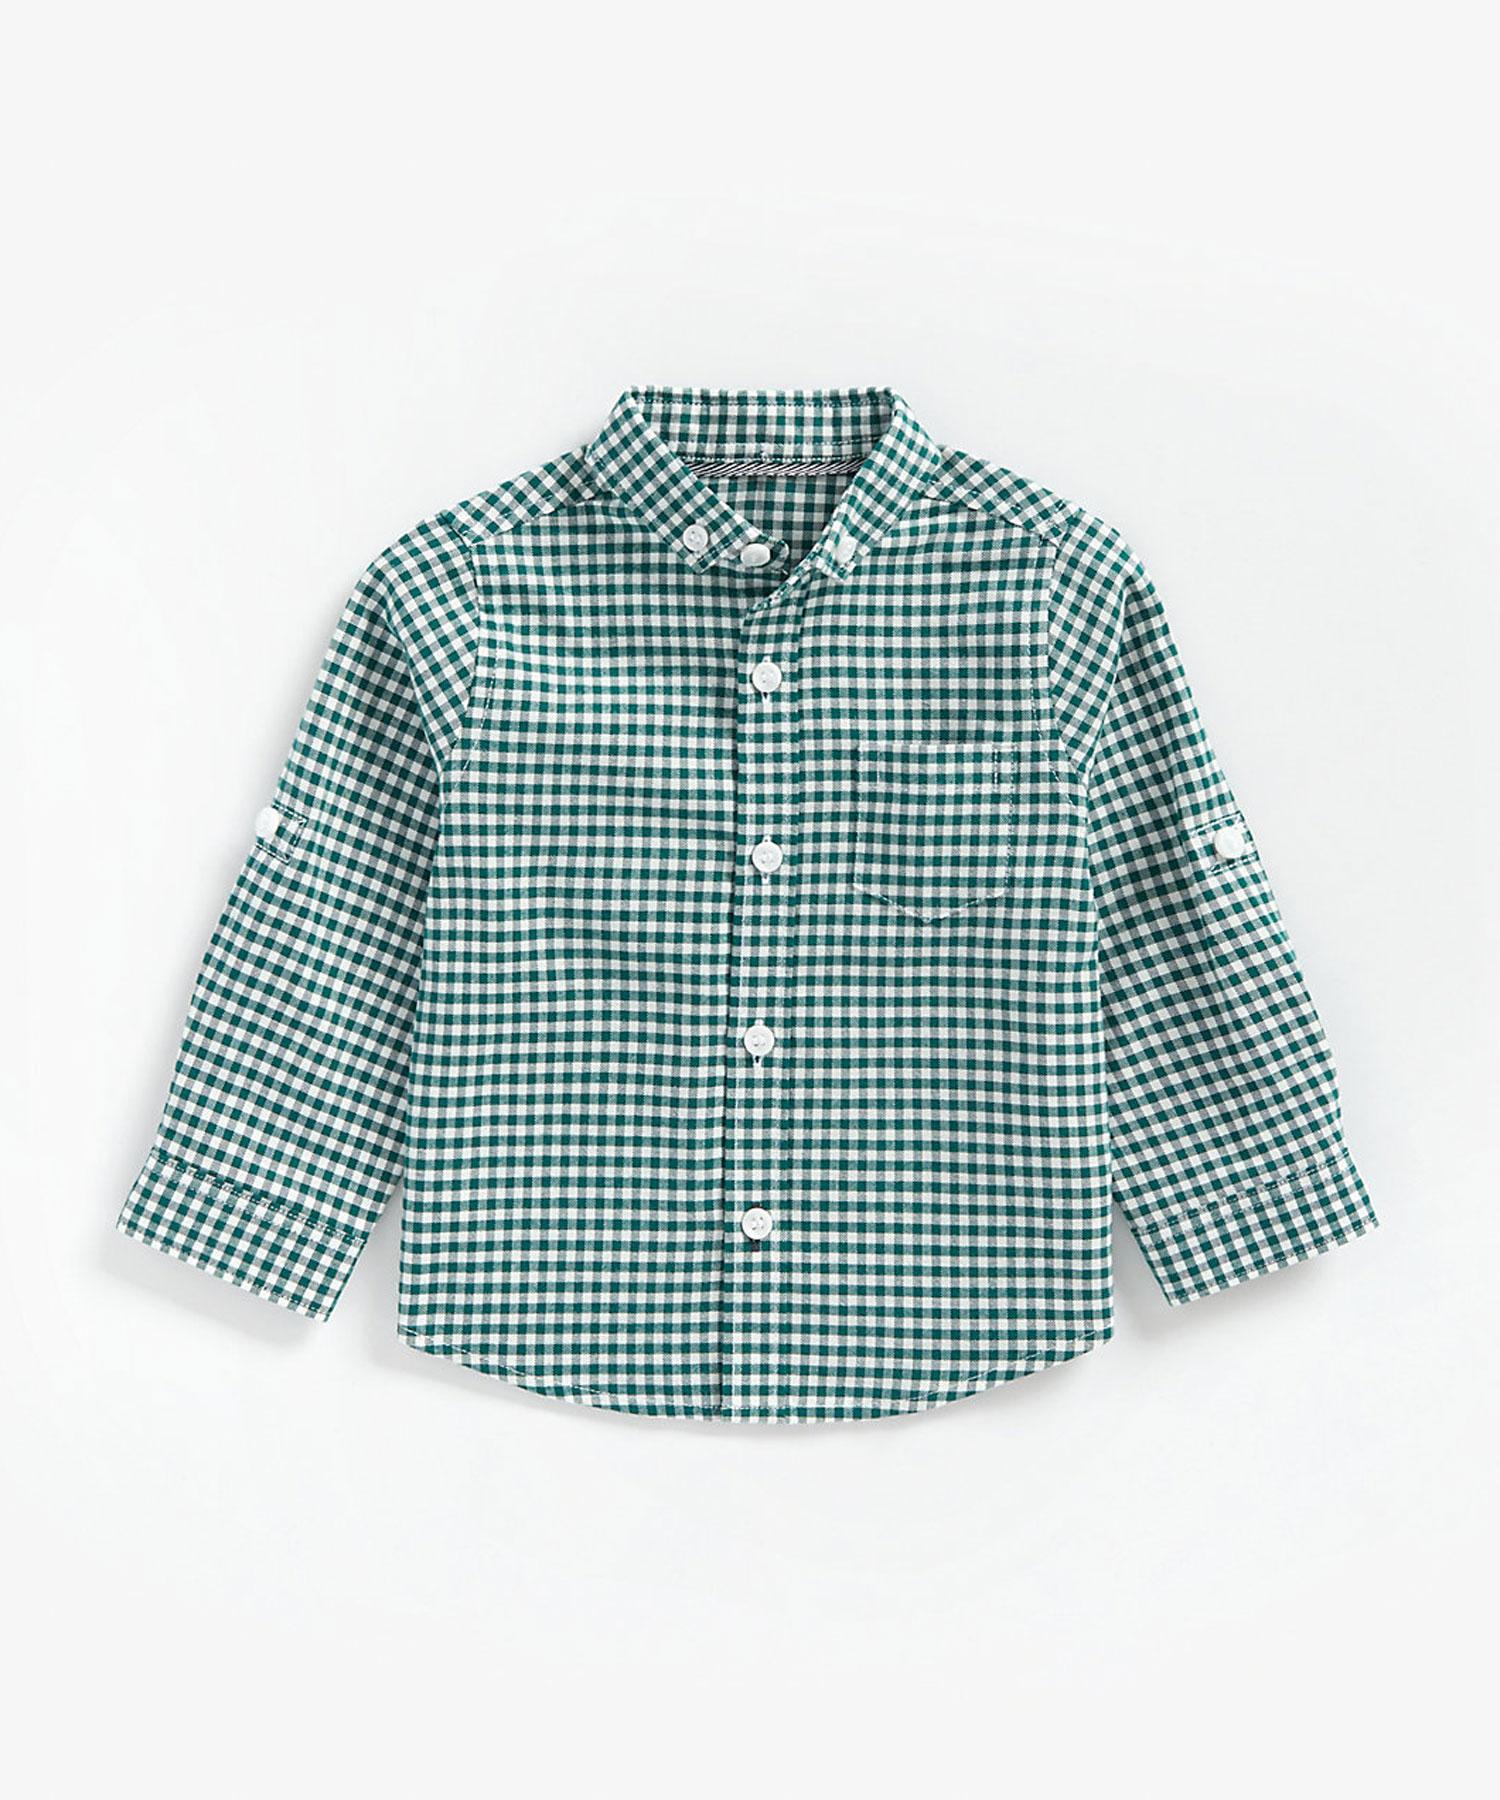 Mothercare | Boys Full Sleeves Oxford Shirt Checks - Multicolor